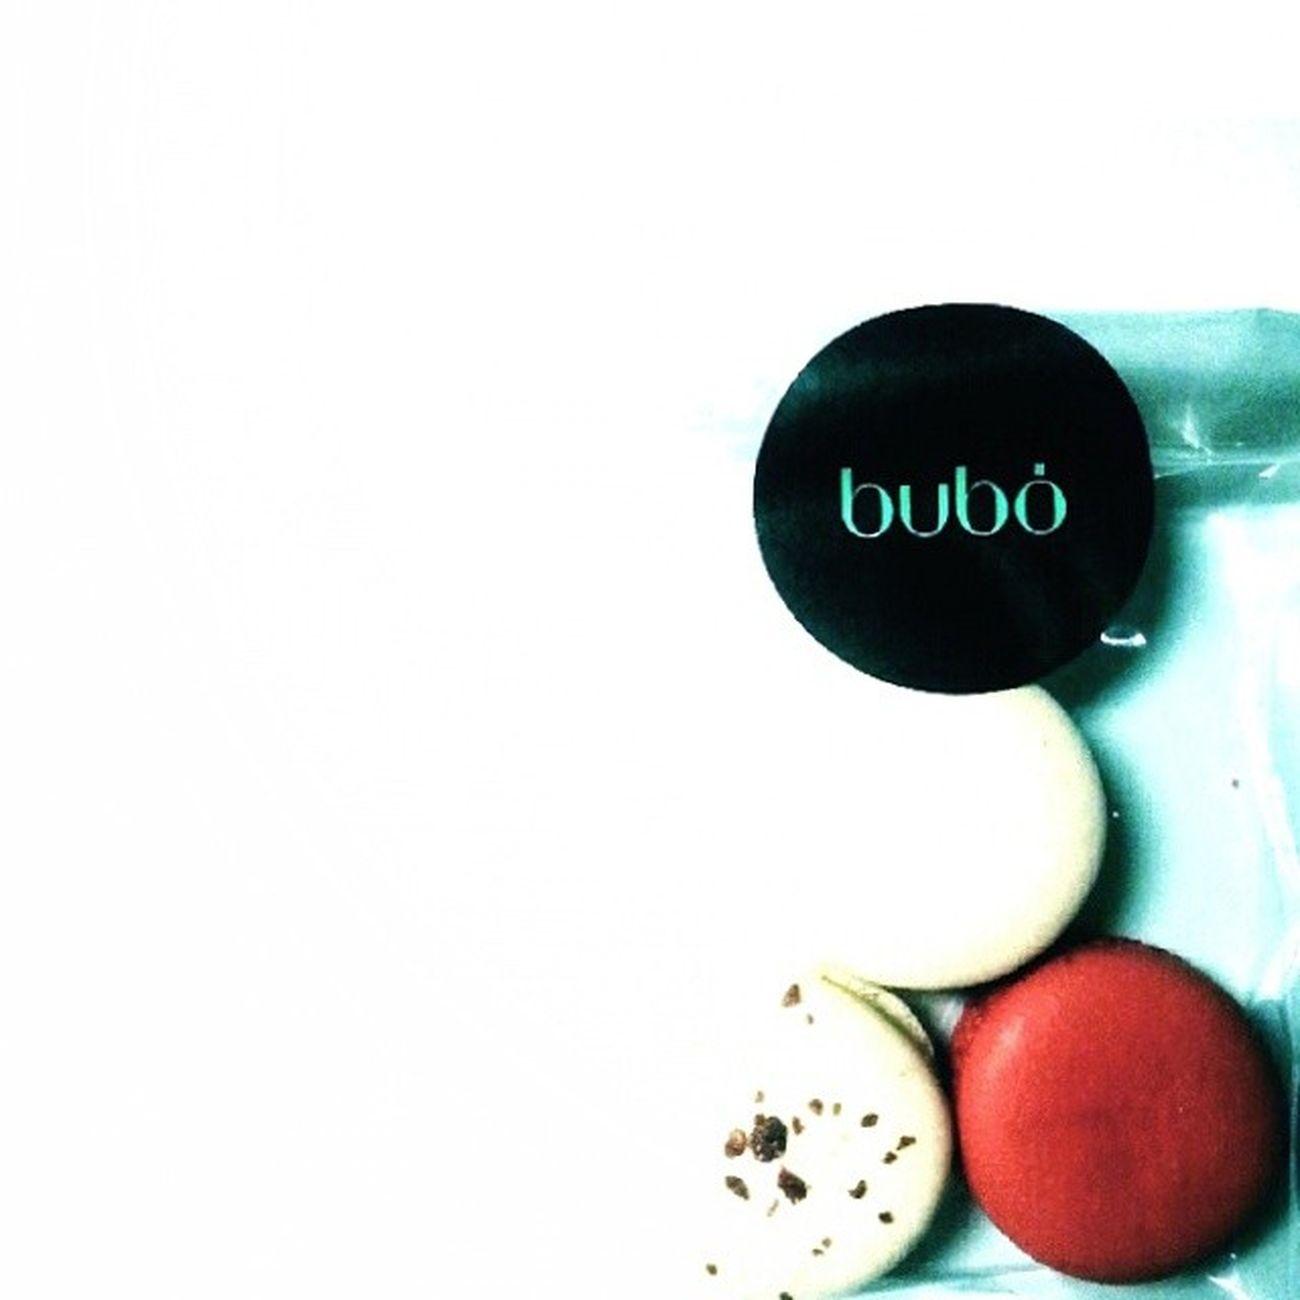 ?MERIENDAS ? @bubobarcelona Bubobarcelona Macarons Gastrovictim Delicatessen petitsplaisirs sweet details colours flavours foodies